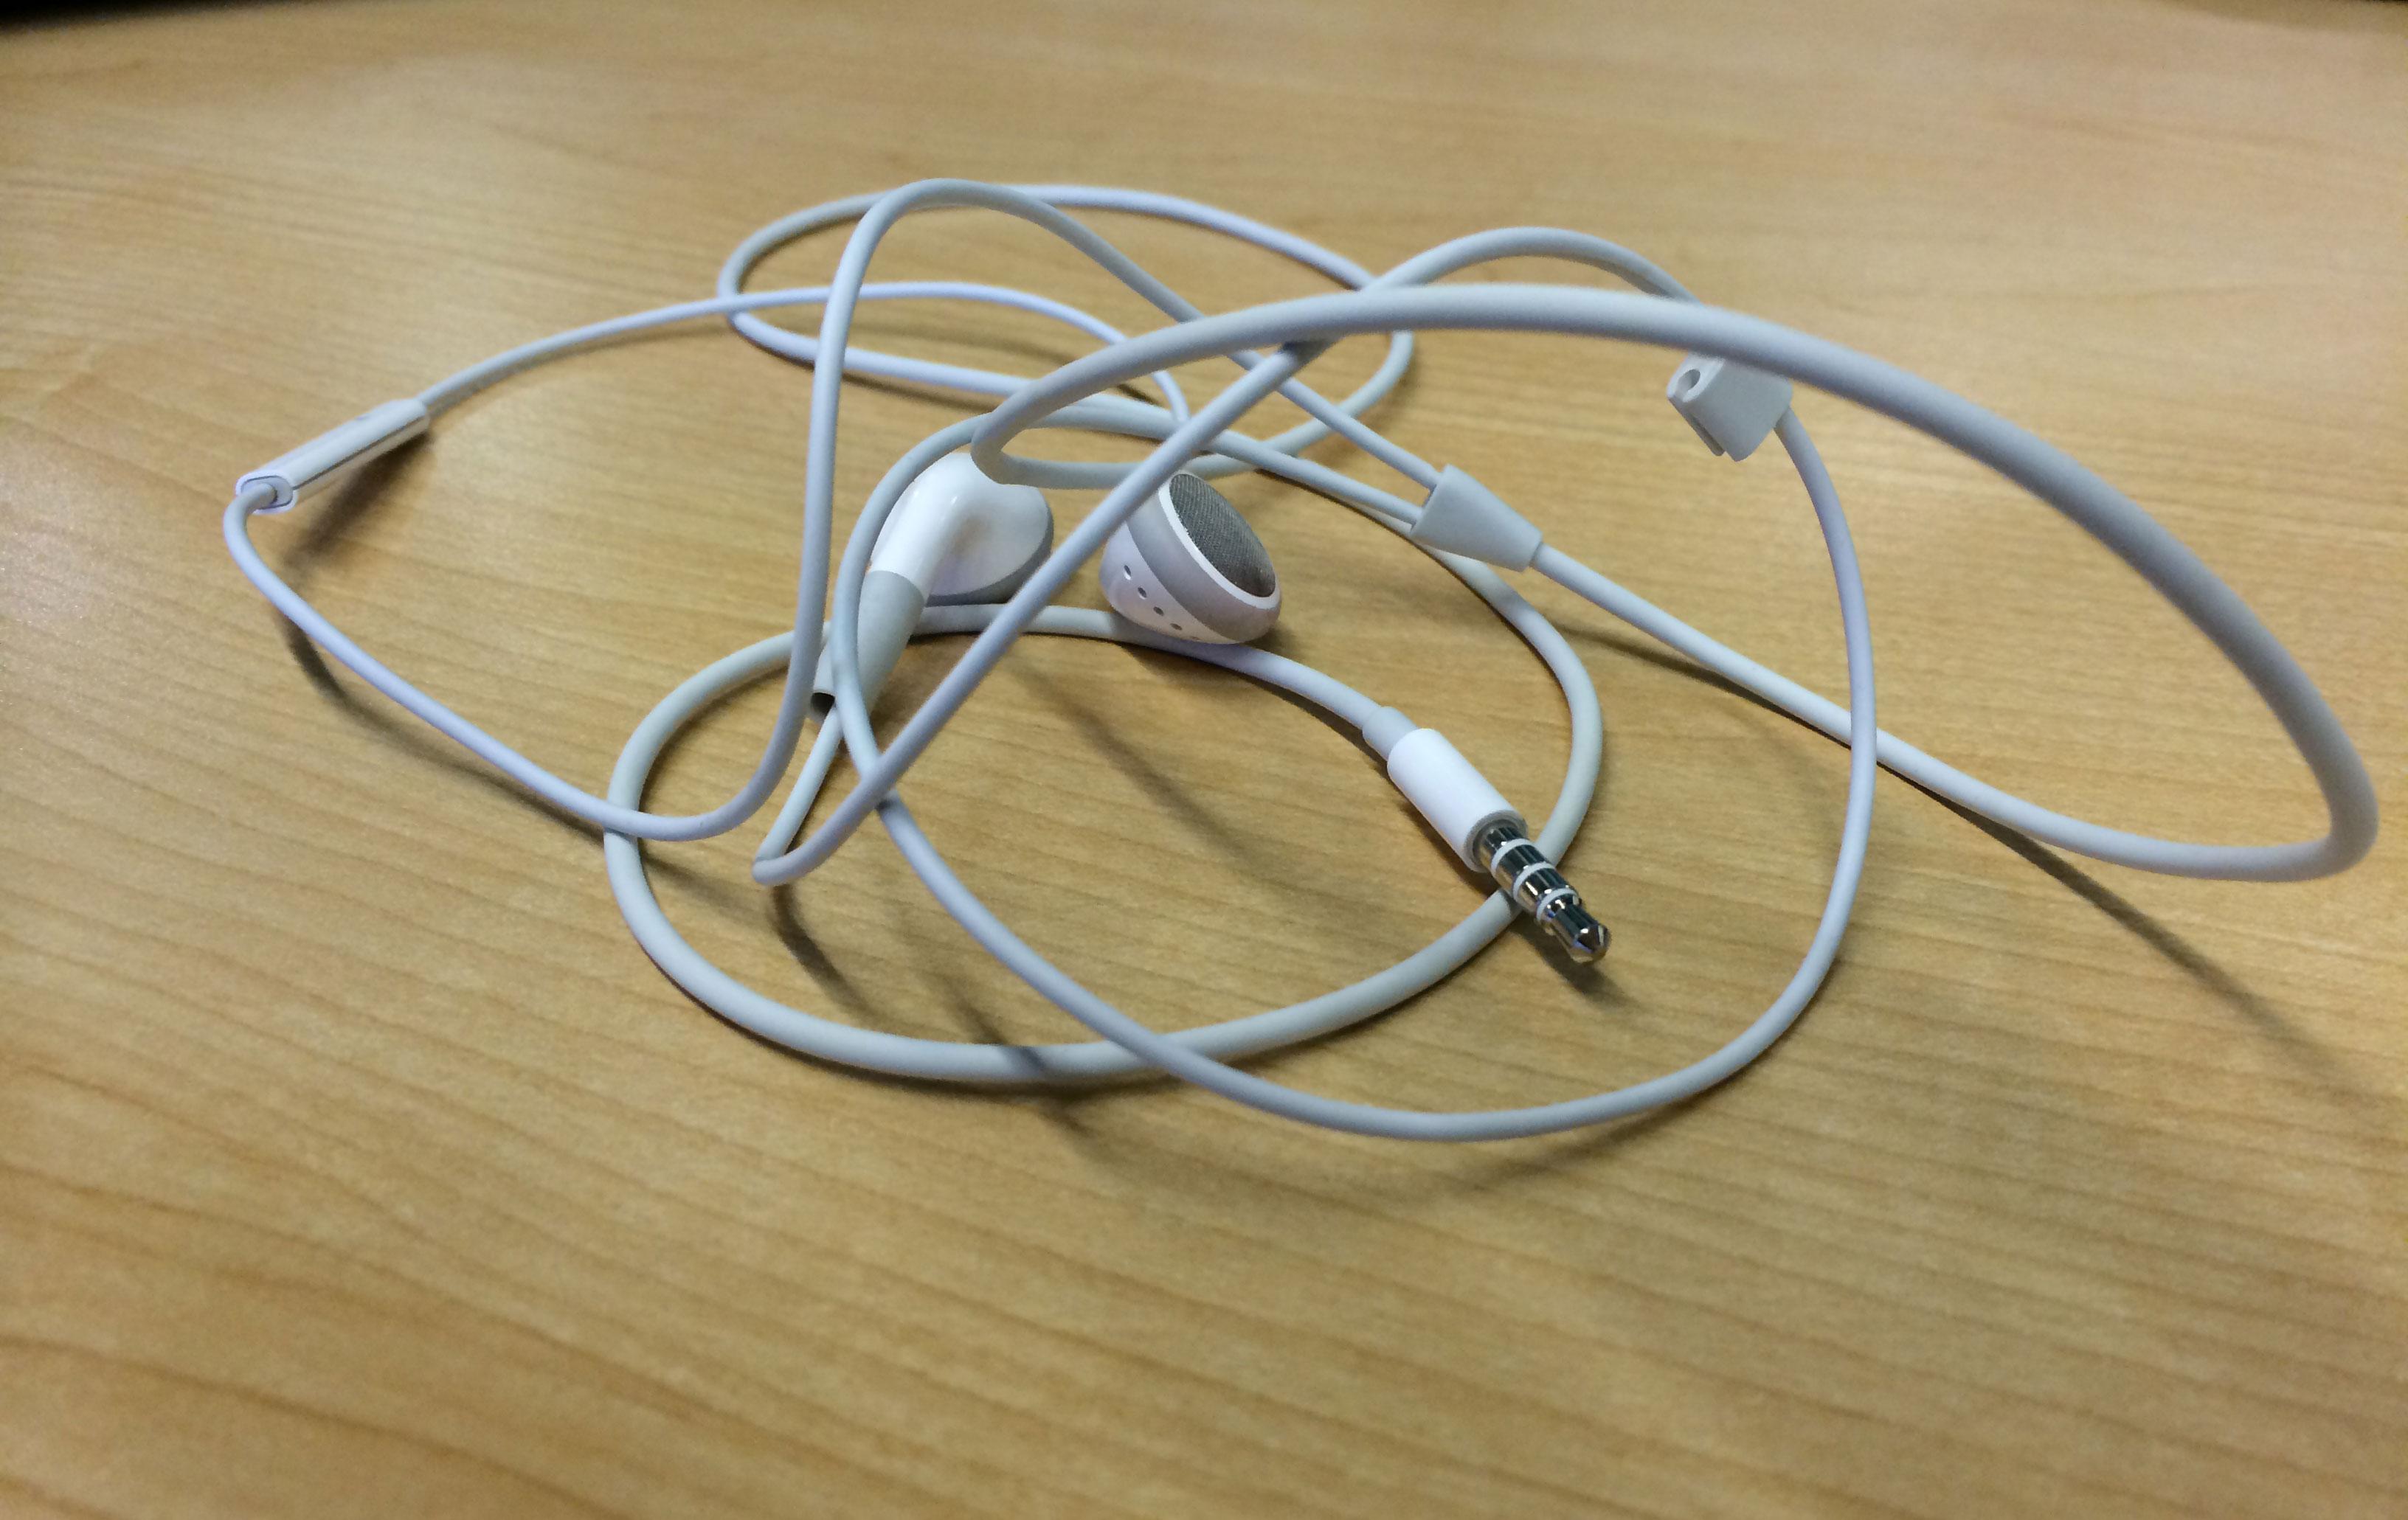 The secret to eliminate headphone knots? (Video)